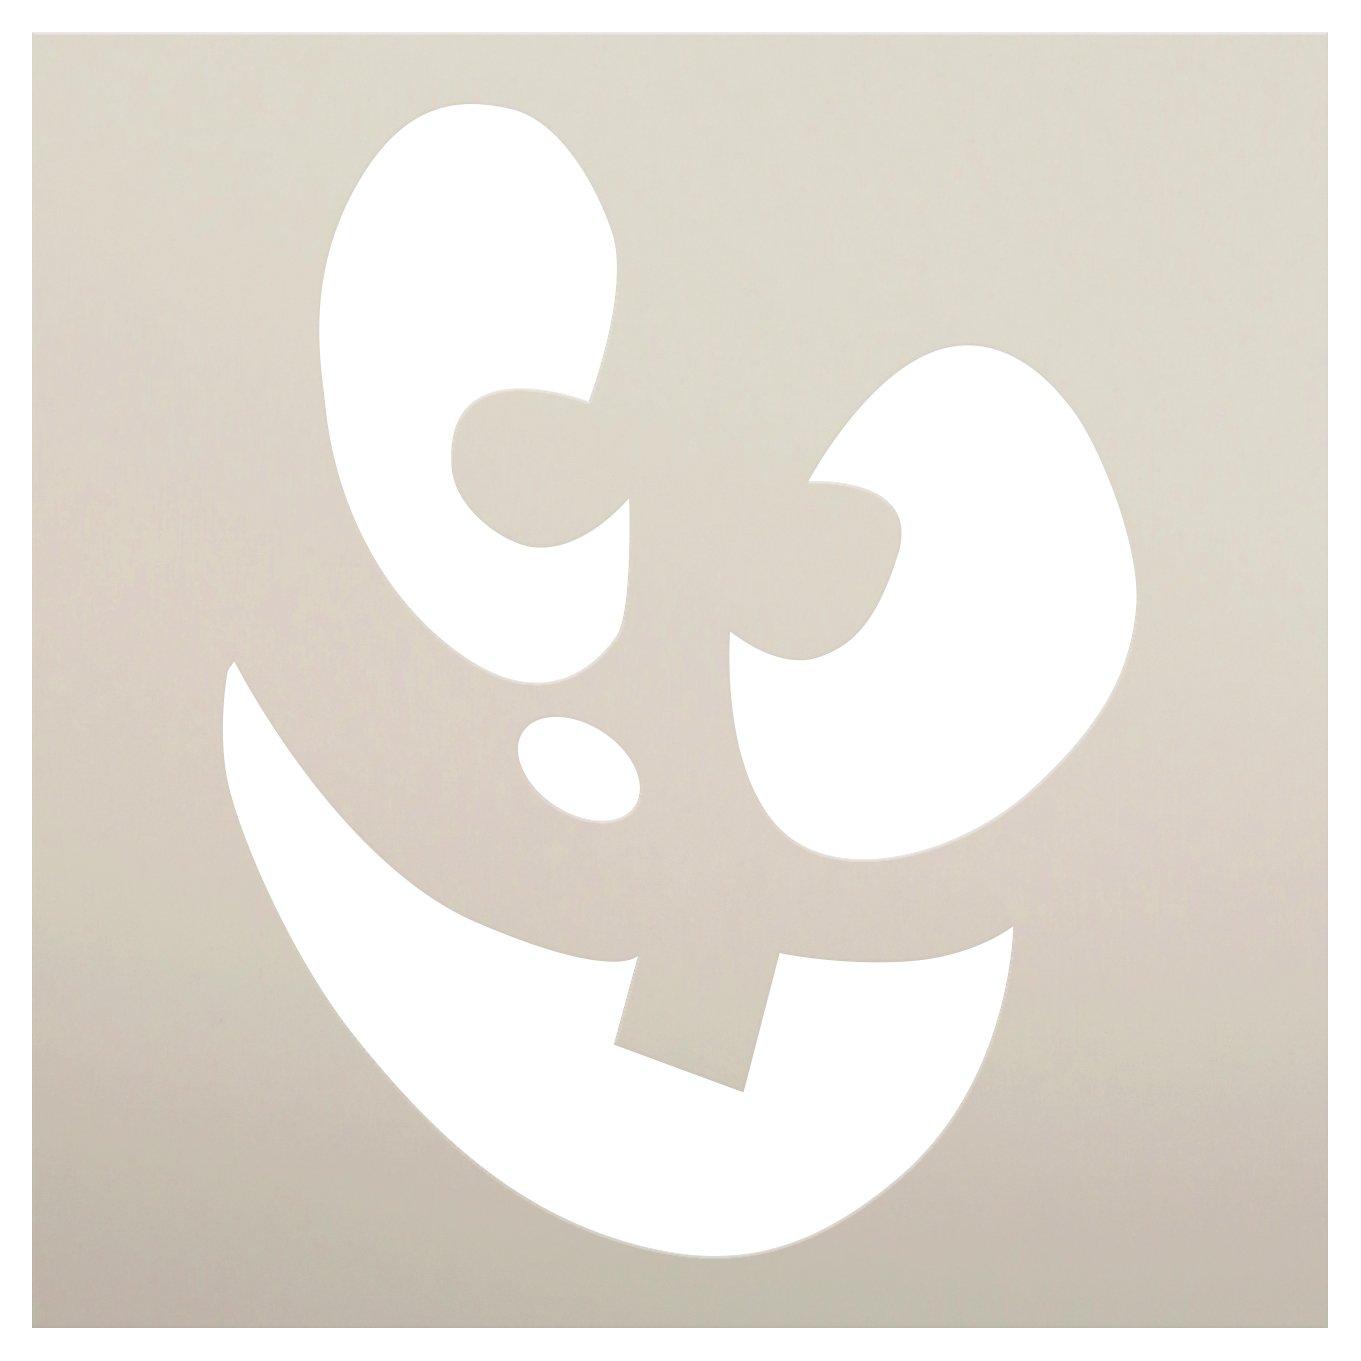 Cheerful Jack-O-Lantern Stencil by StudioR12 | Craft & Paint DIY Halloween Decor | Fall Pumpkin Face Pattern Template | Select Size